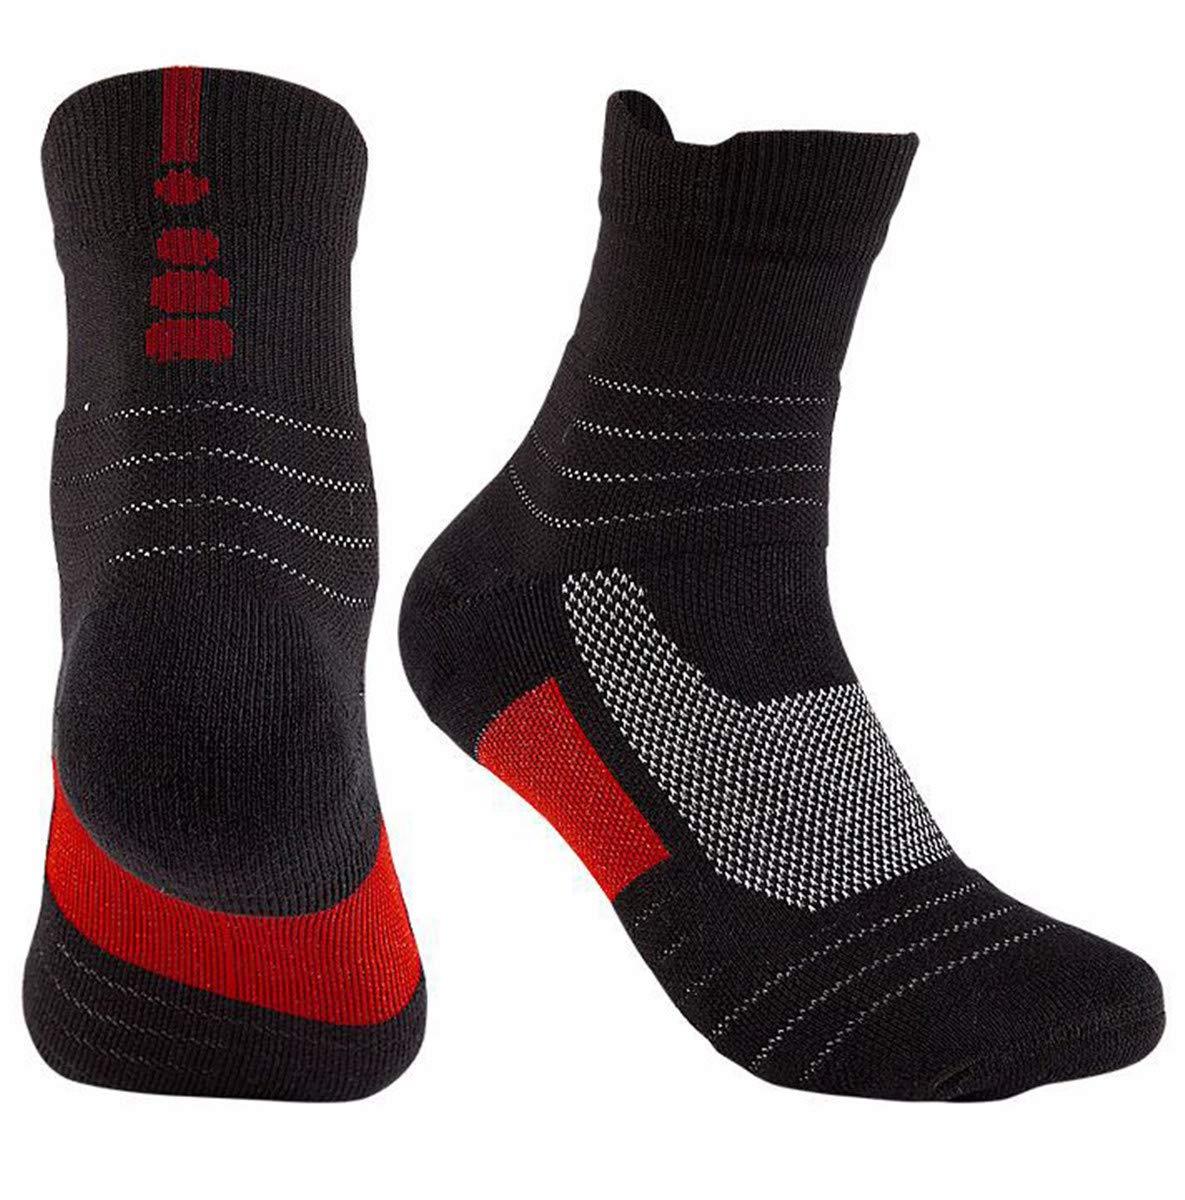 Calzini da Basket Calzini da Corsa allaperto Fondo Asciugamano Tubo Lungo Calzini Sportivi da Uomo SHENHAI Calze